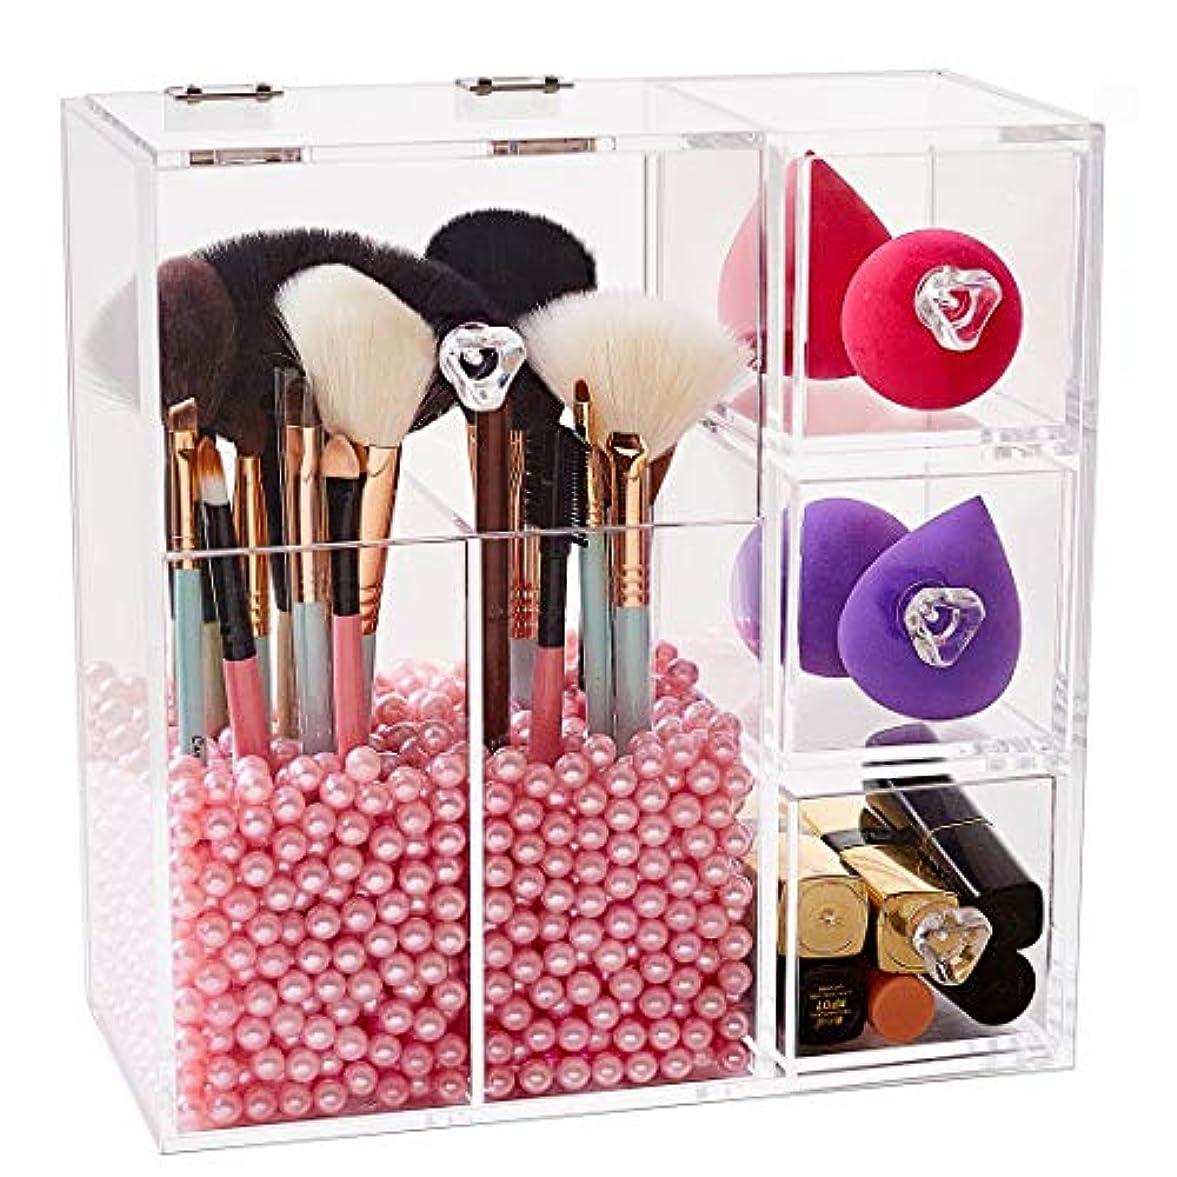 HBLIFE 化粧品収納ボックス 透明アクリル メイクケース コスメ 口紅 収納スタンド 引き出し小物/化粧品入れ レディース ジュエリーボックス 小物 収納 メイクボックス 女の子のギフト プレゼント最適